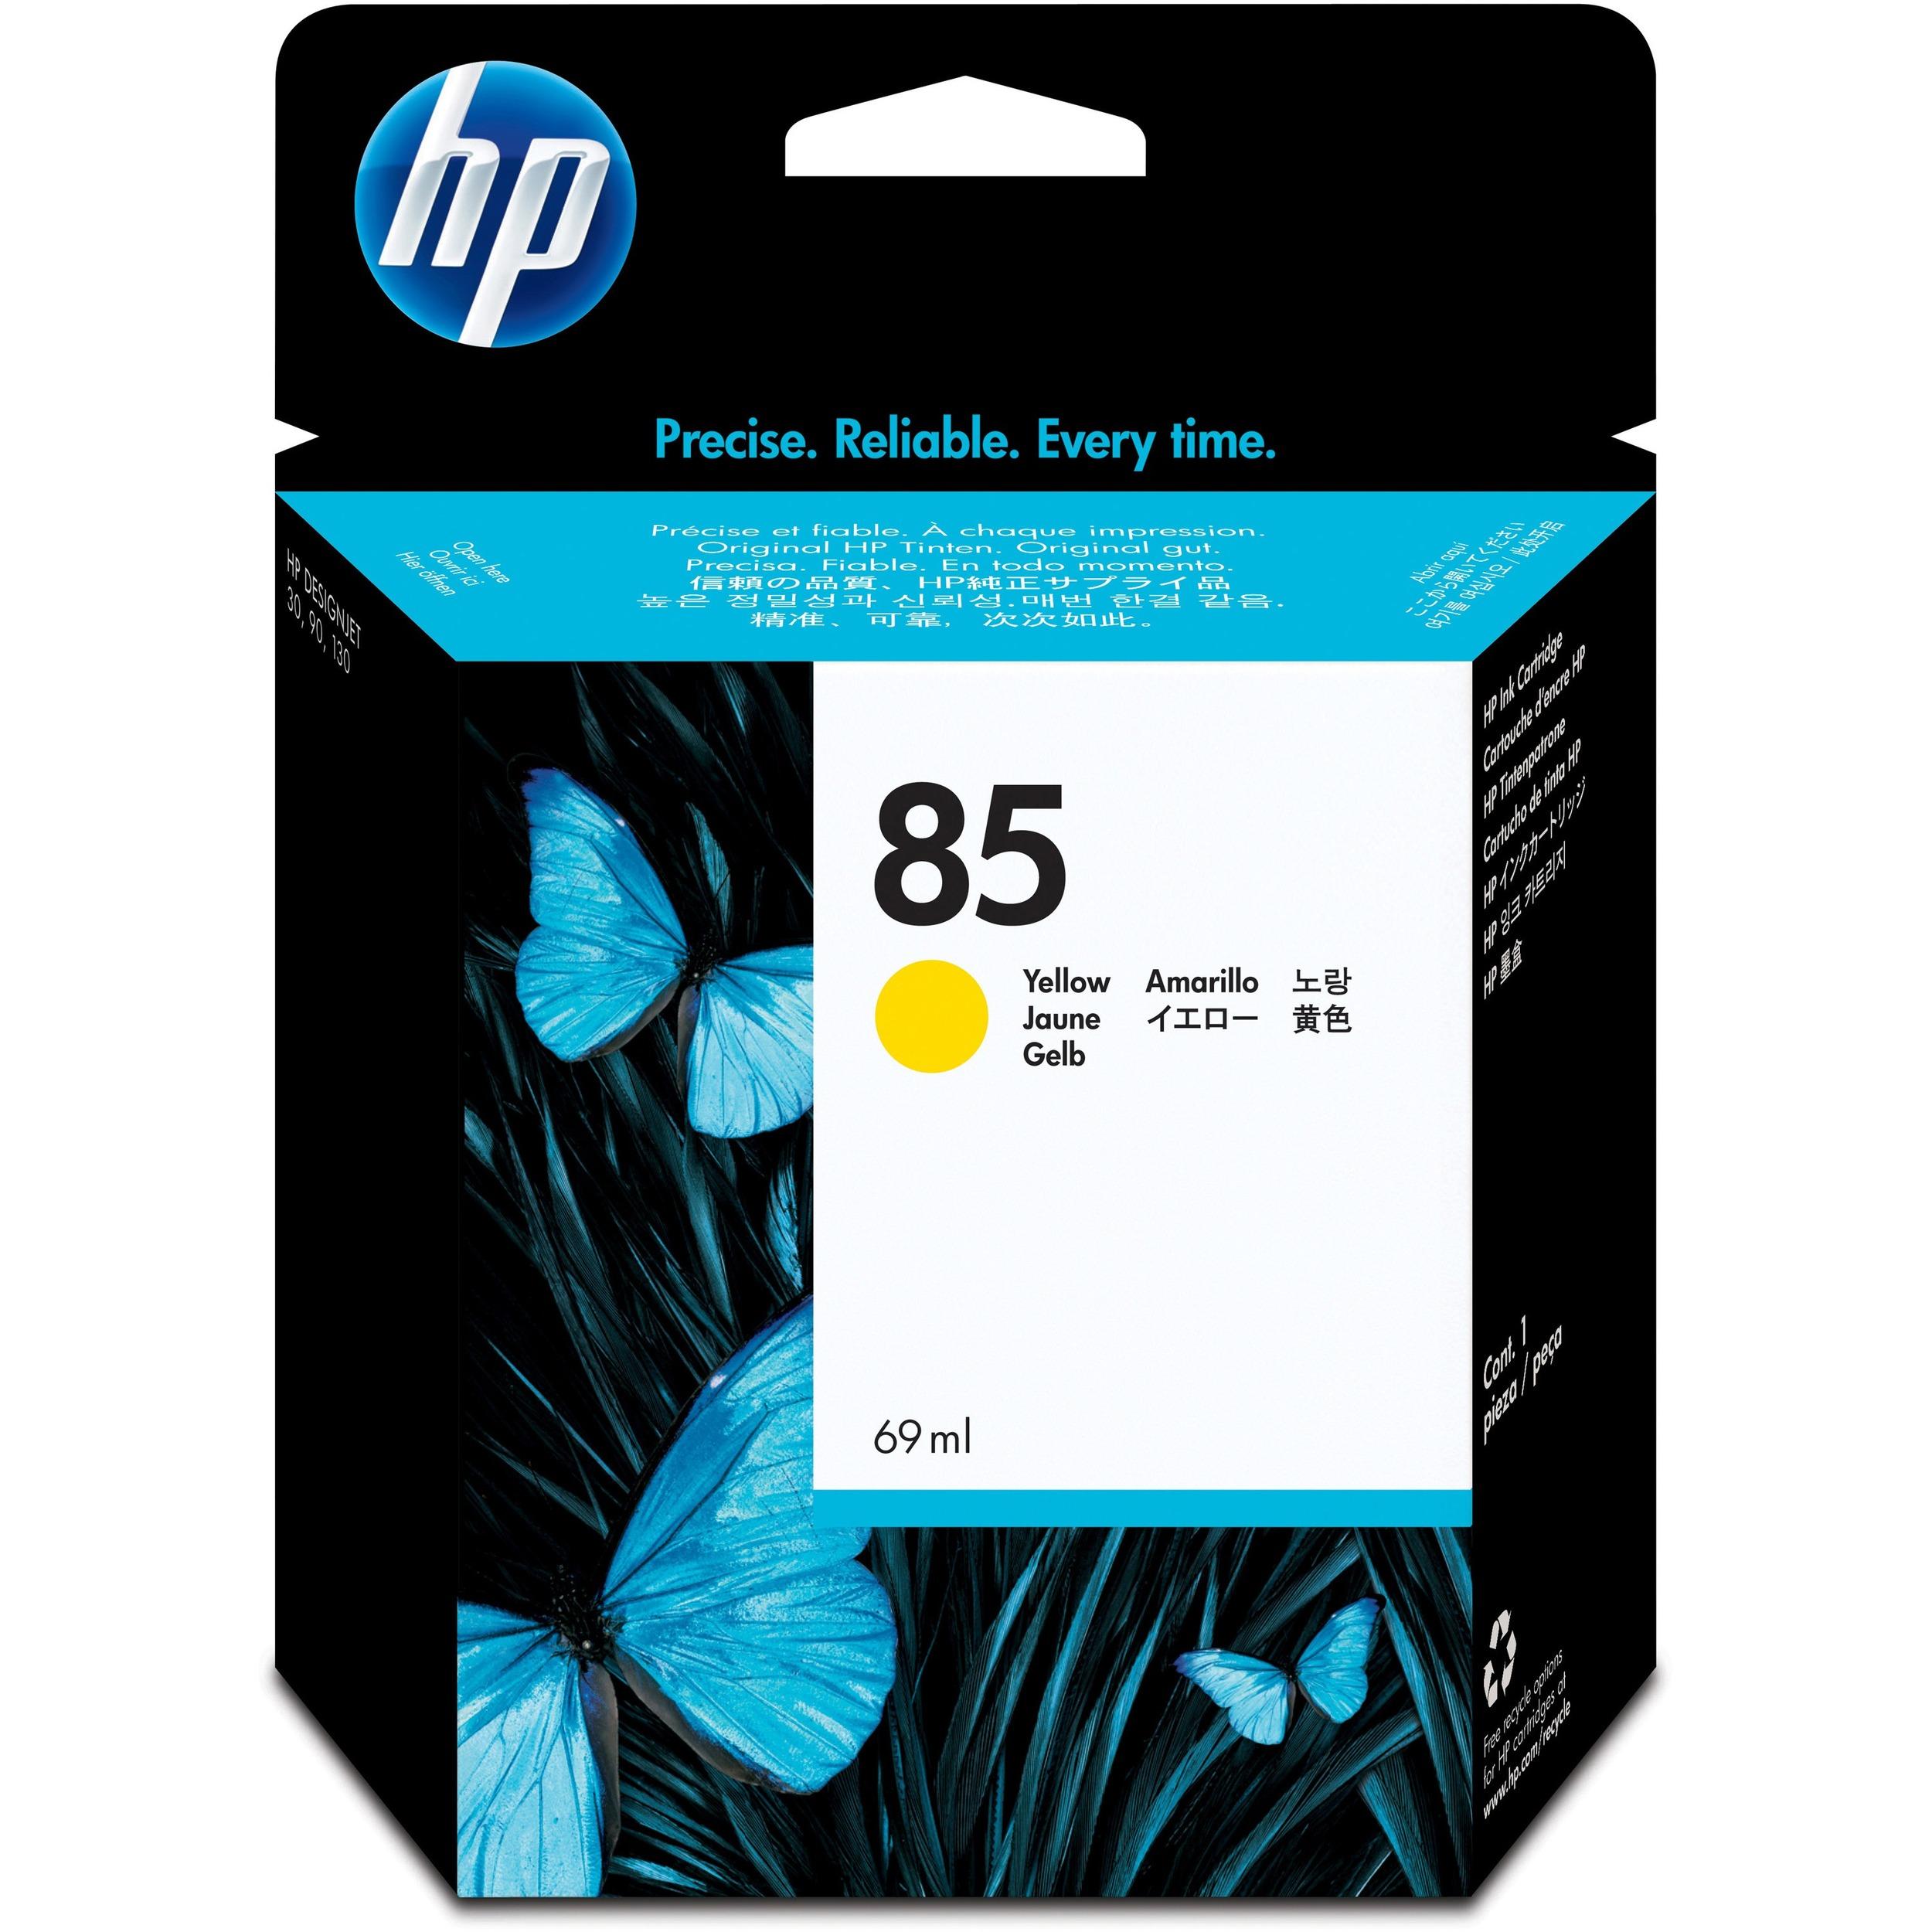 HP No. 85 Ink Cartridge - Yellow